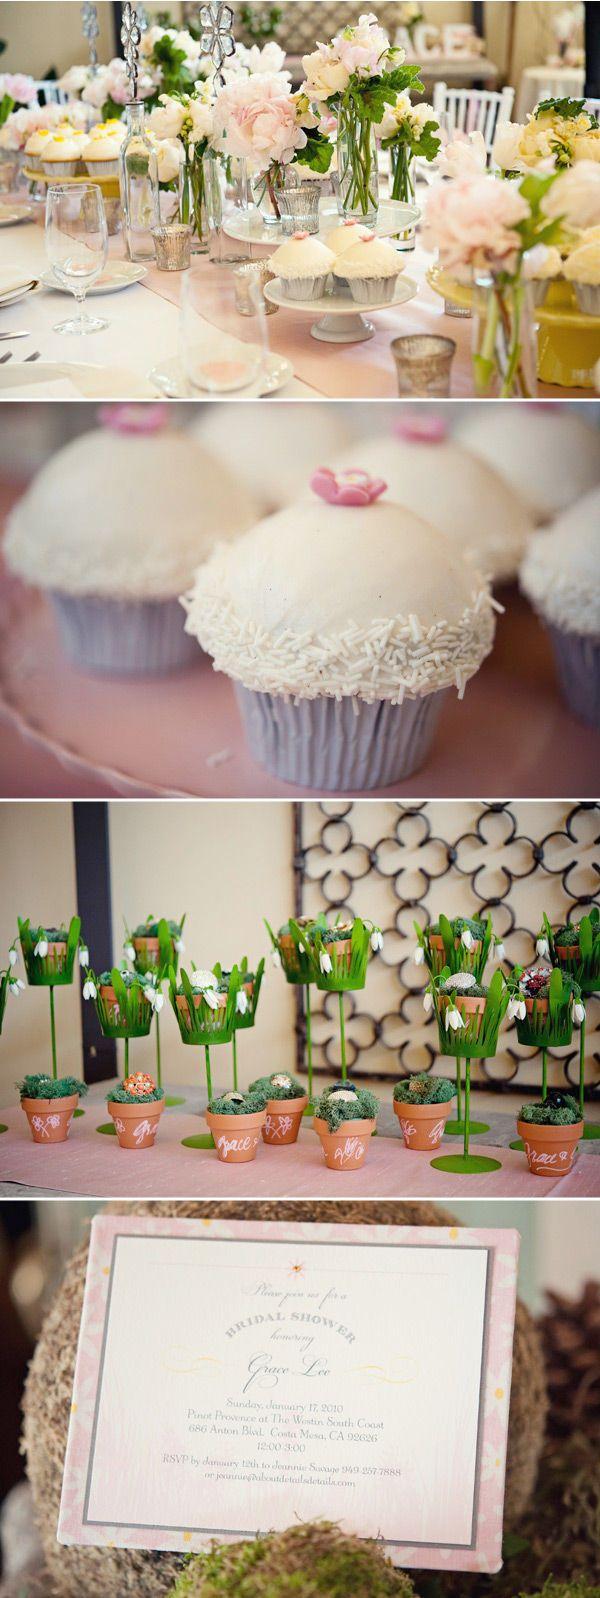 80 best images about bridal luncheon on pinterest wine for Unique tea party ideas